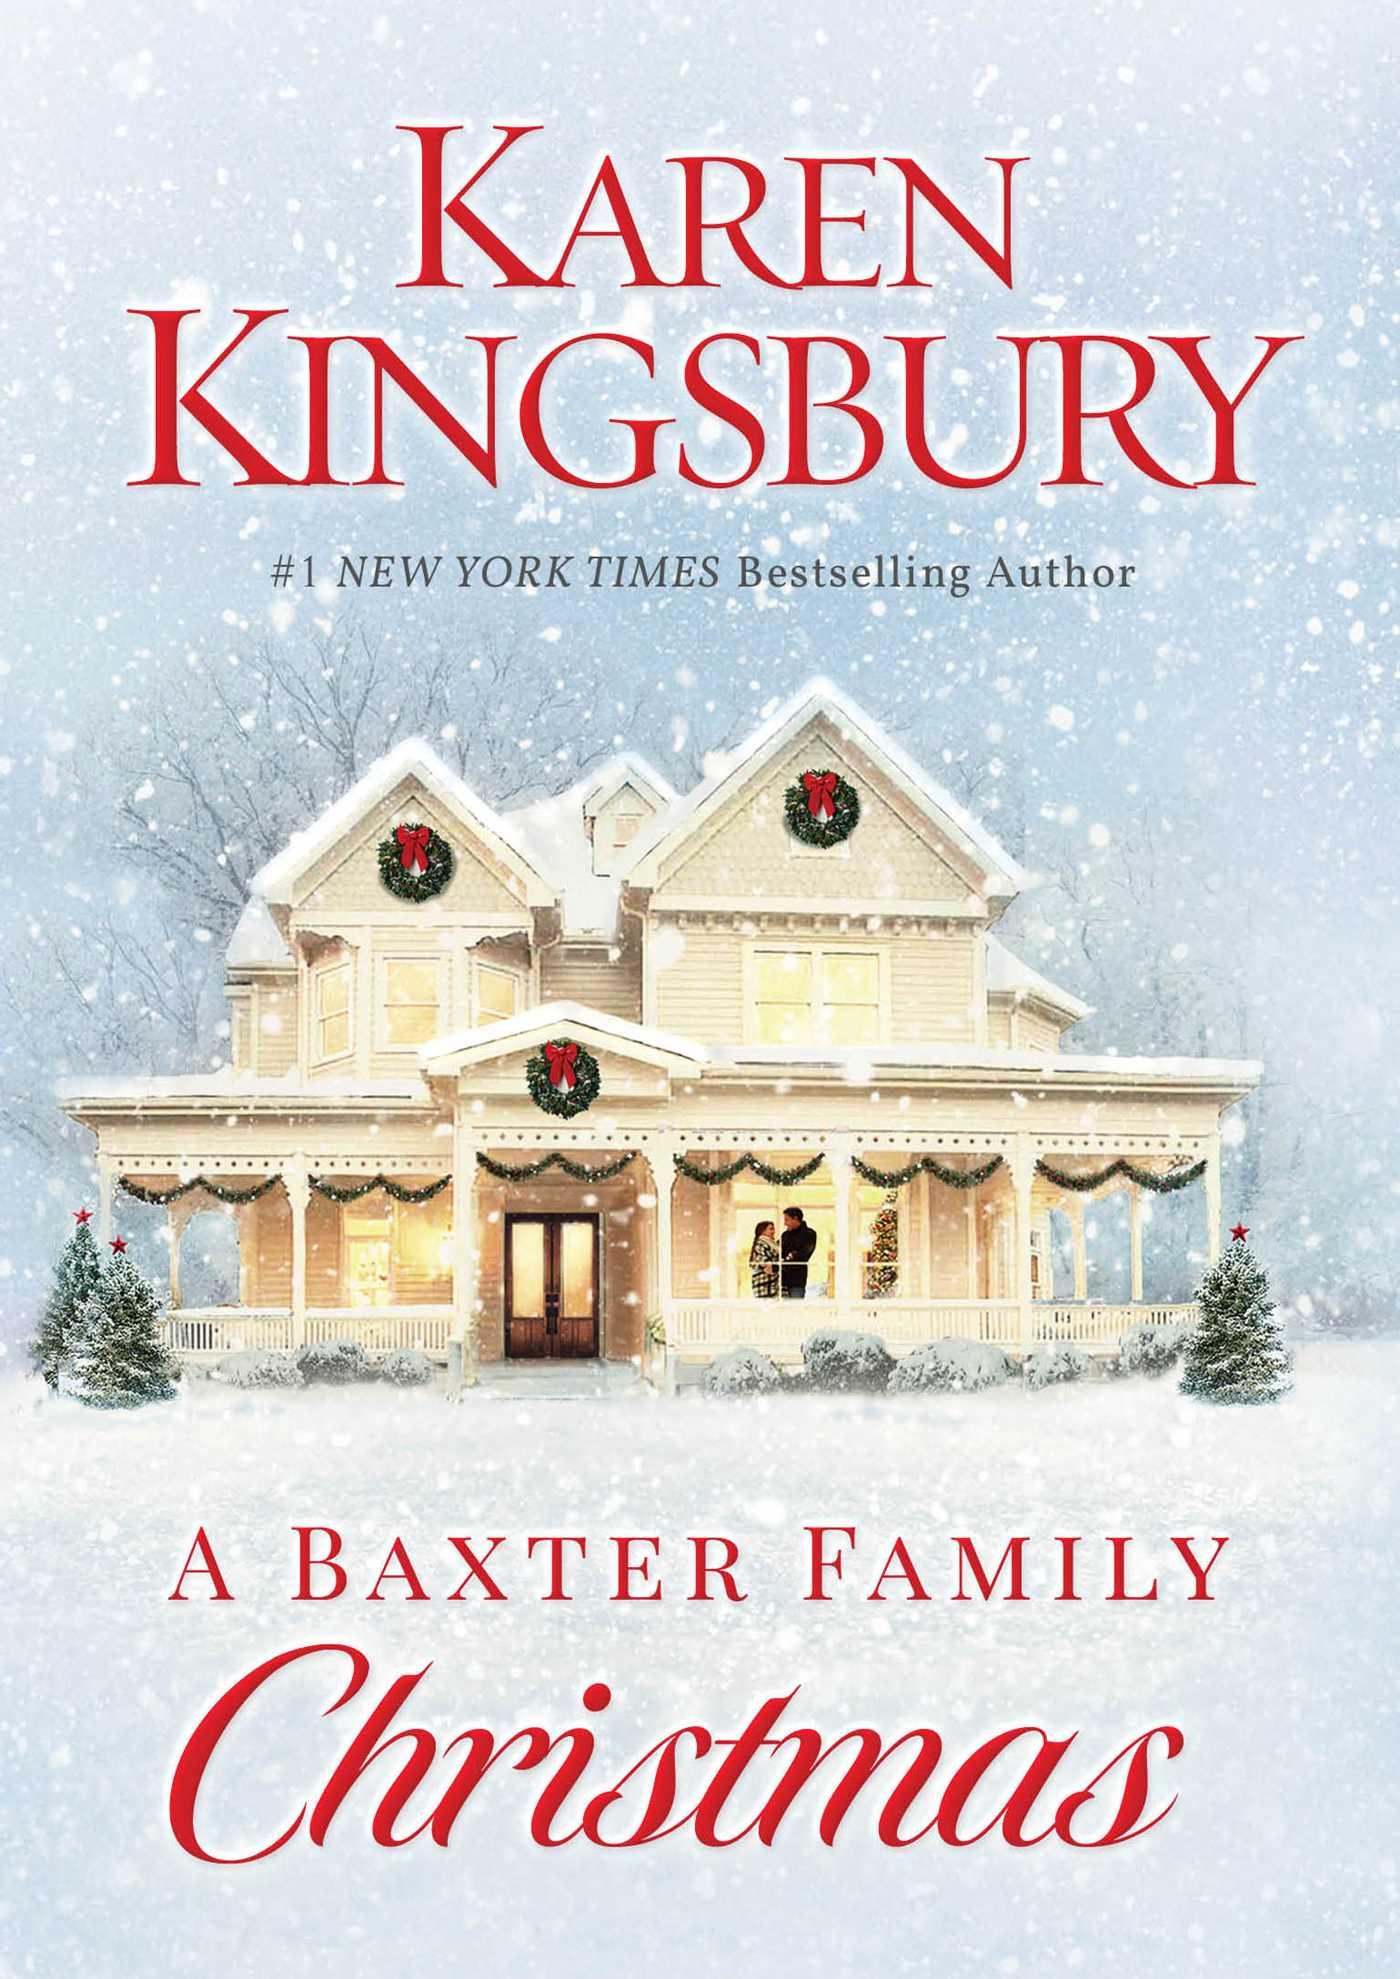 A baxter family christmas 9781451687569 hr